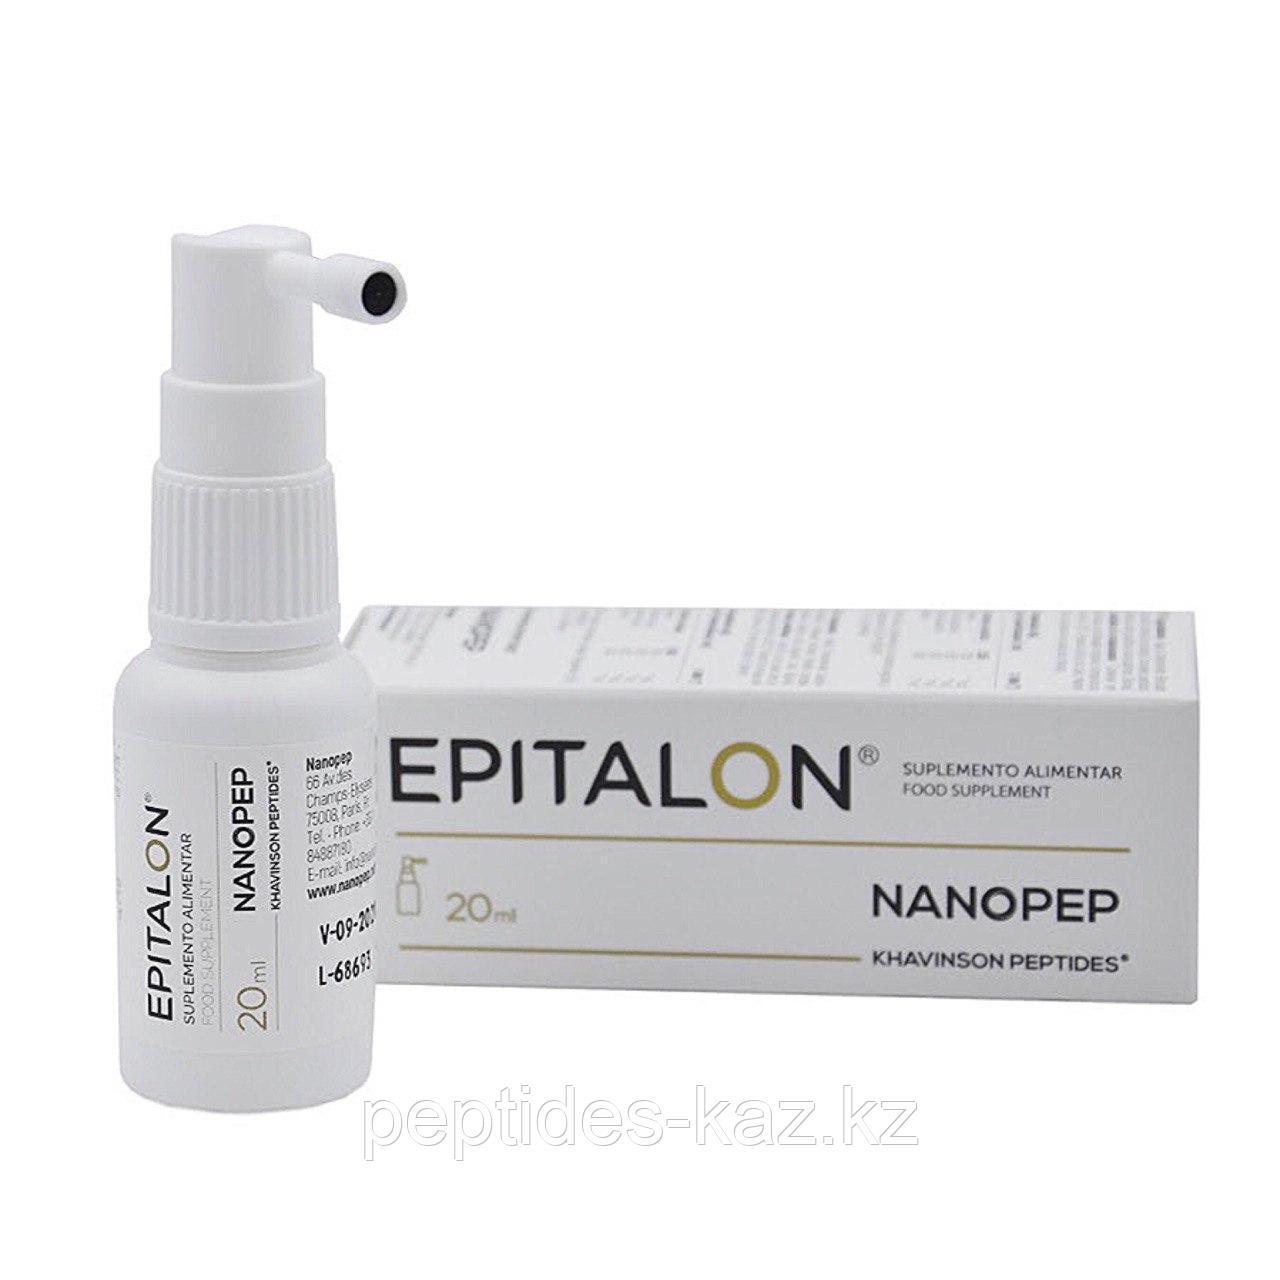 ЭПИТАЛОН спрей с пептидом эпифиза - Epitalon  20мл